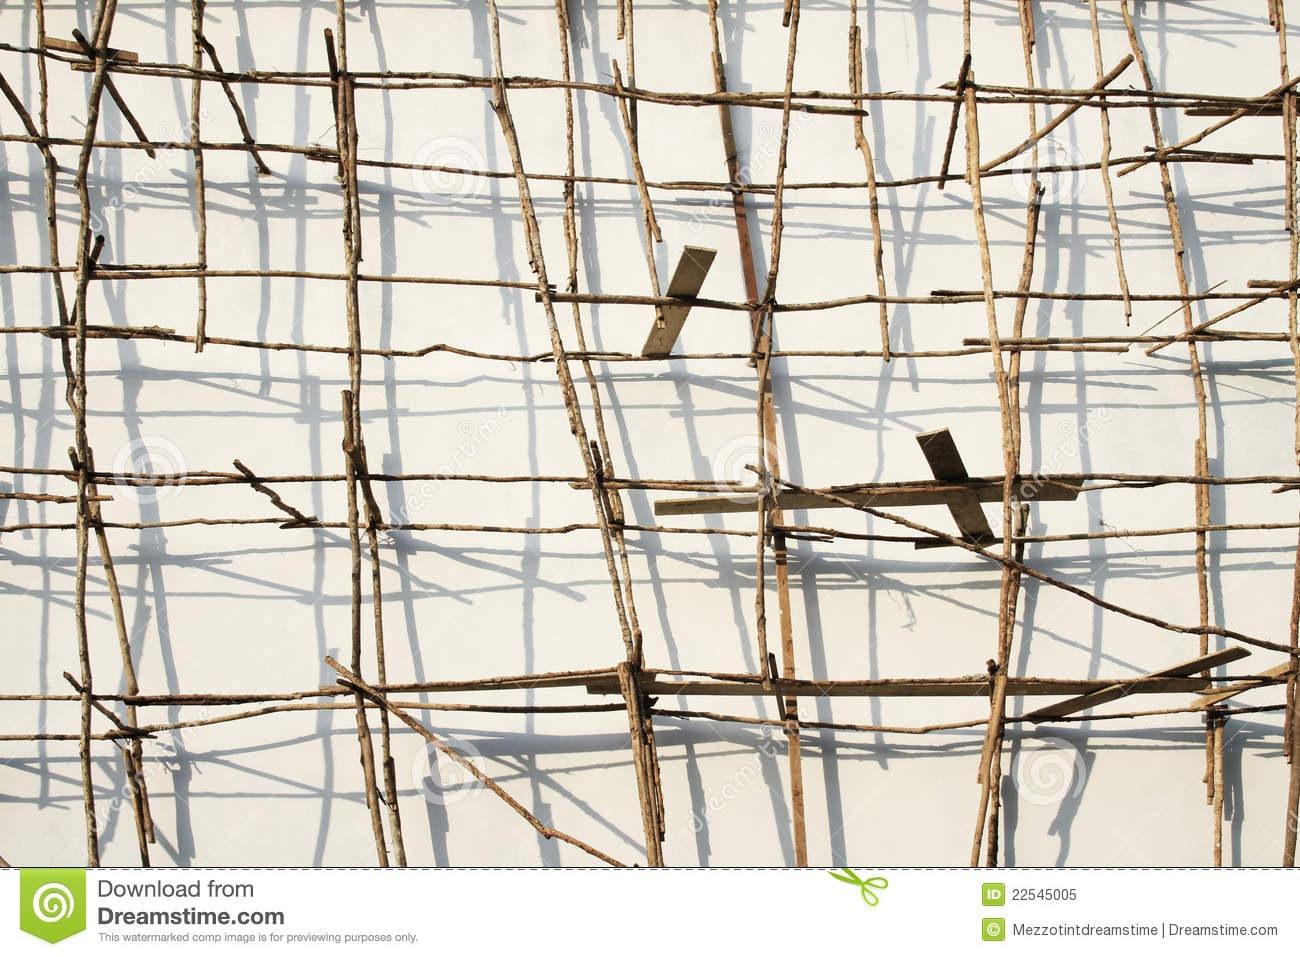 scaffolding.jpg.08b768de5125941c5ea85cb0089cd580.jpg